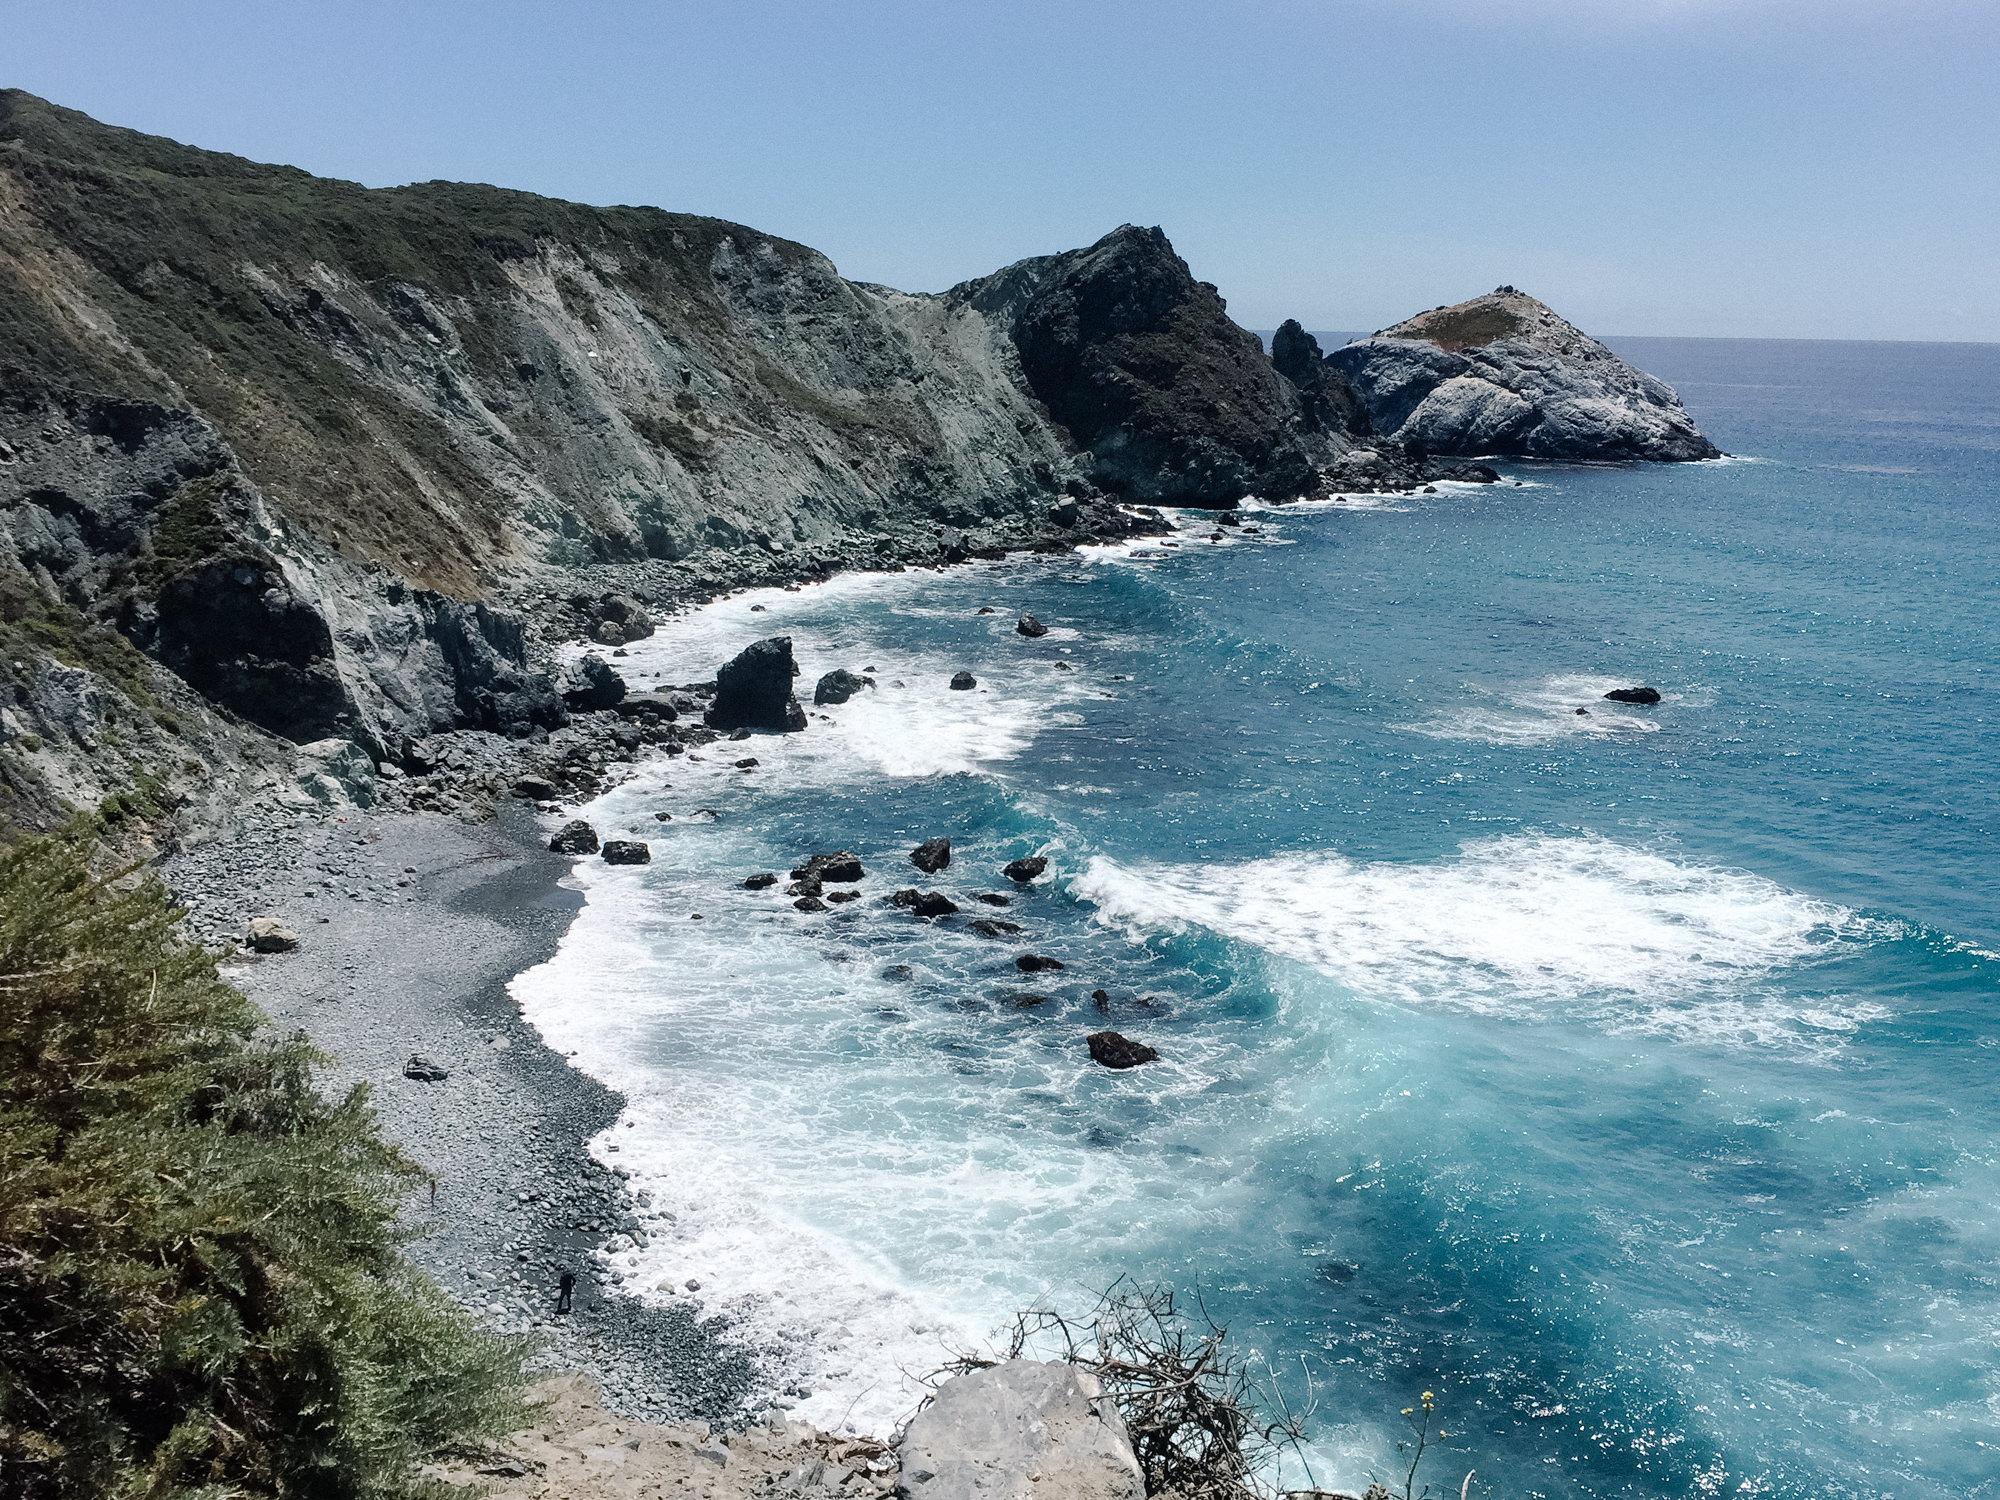 pacific_coast_road_trip-5.jpg